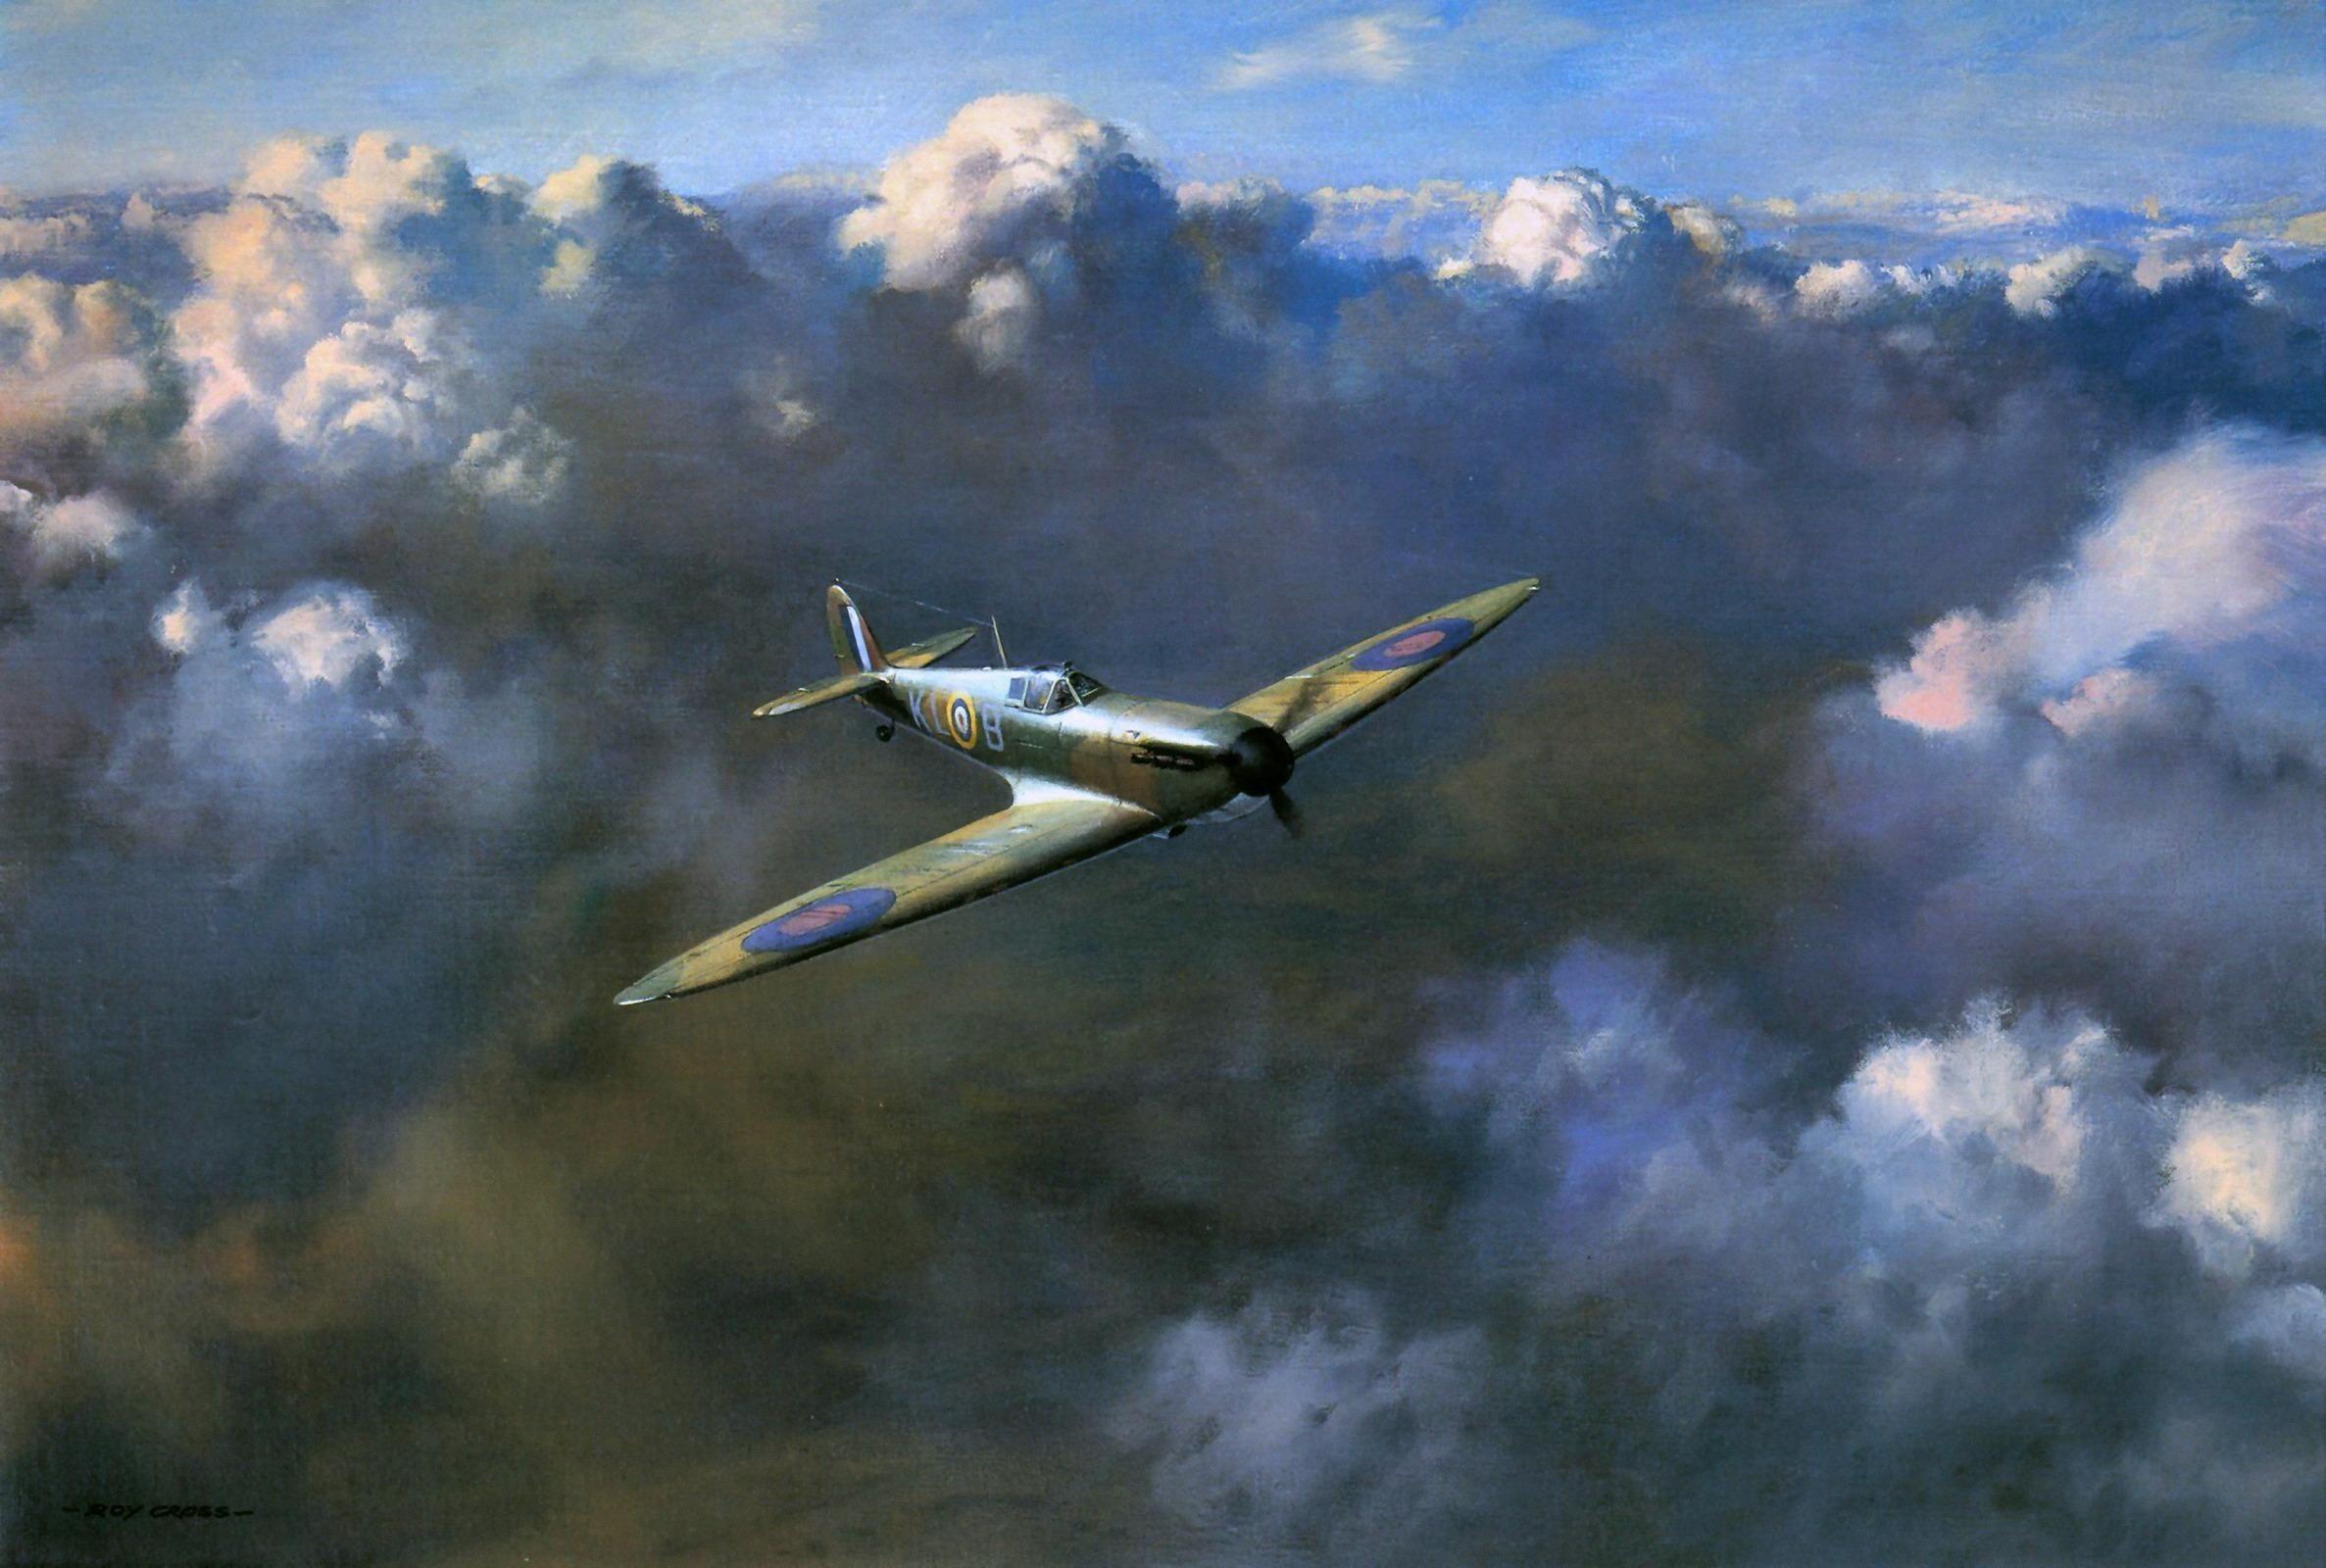 Spitfire Mki >